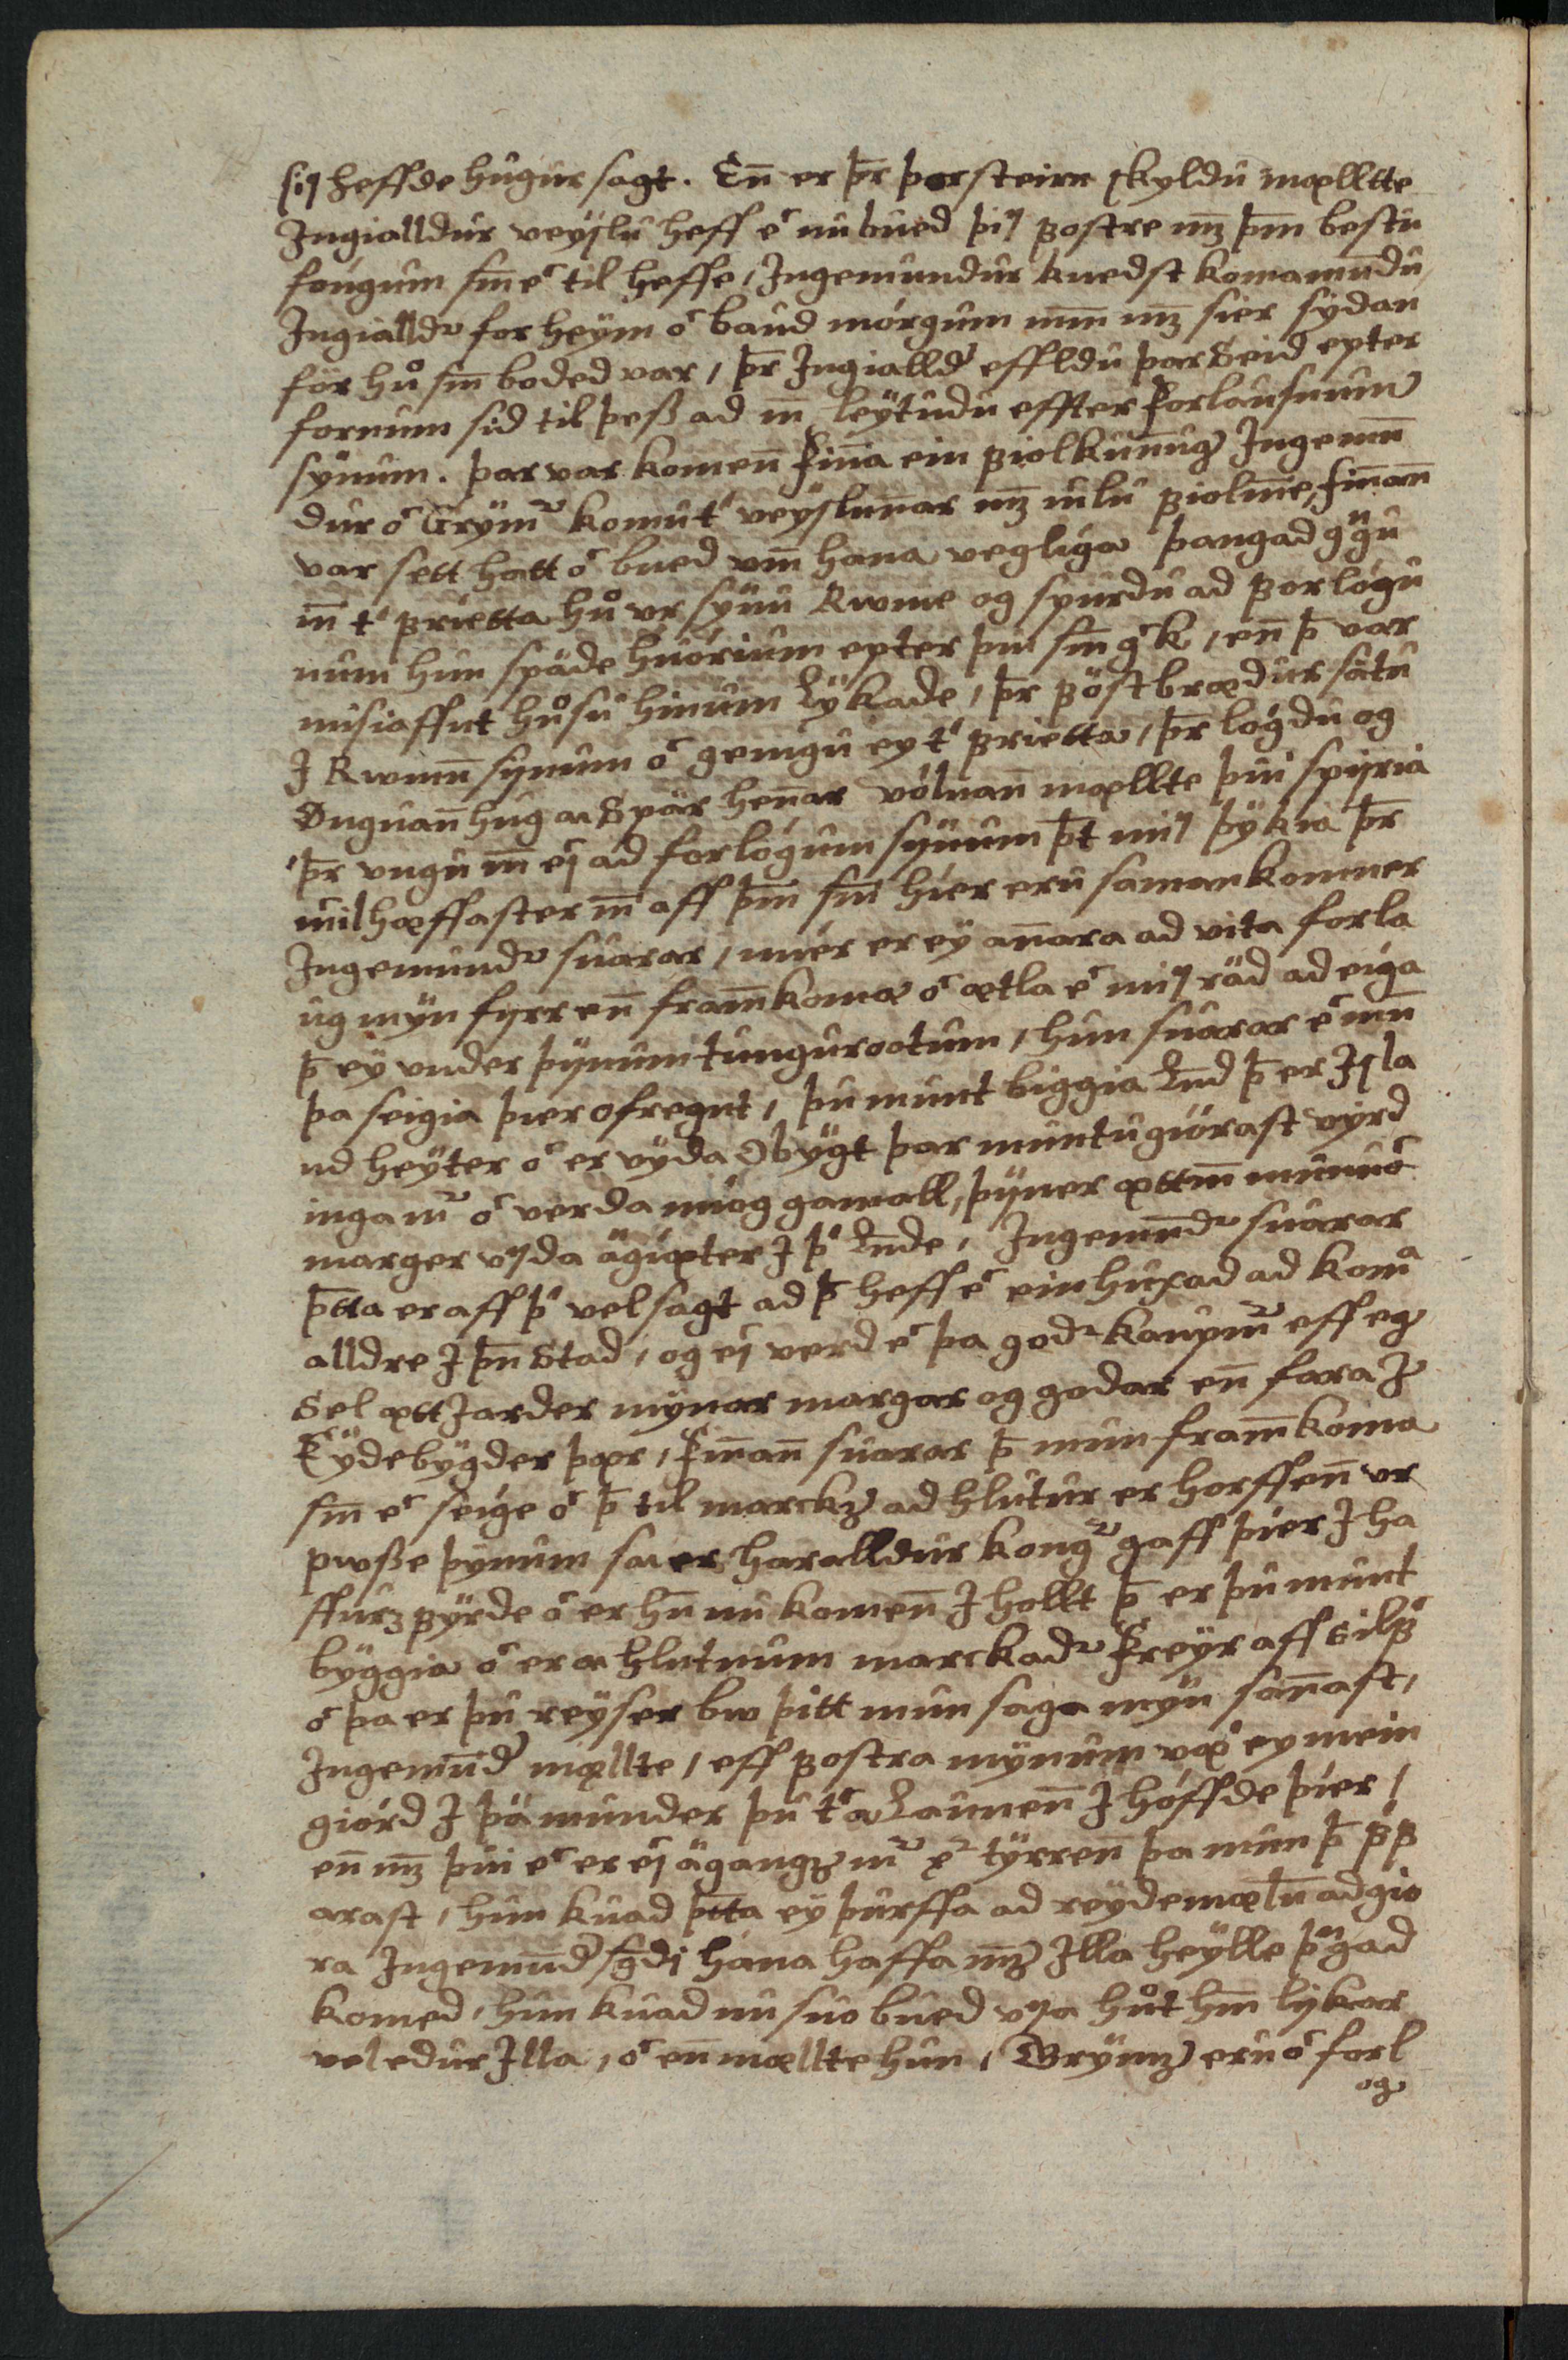 AM 138 fol - 9v